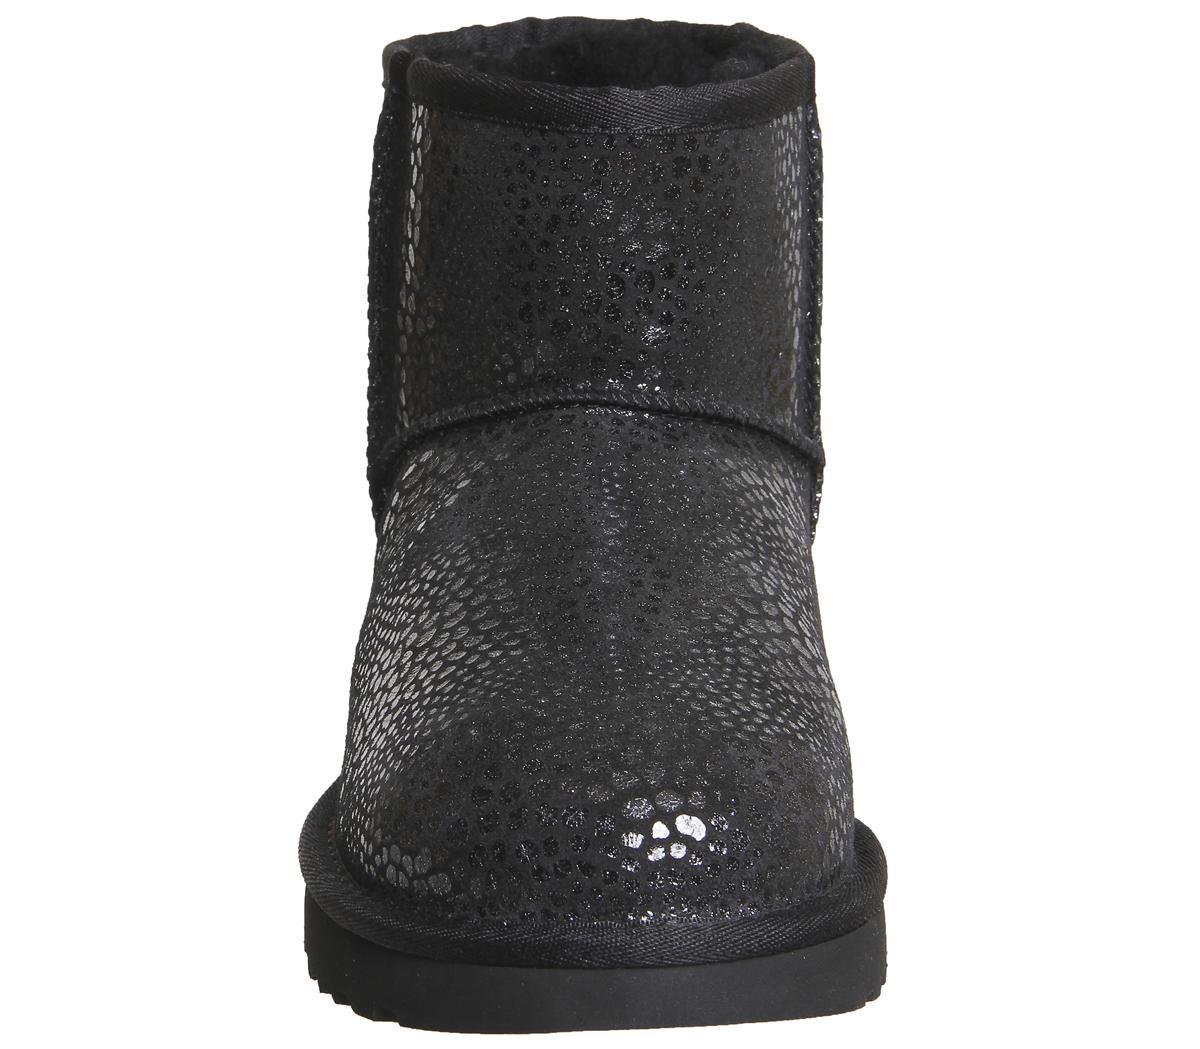 UGG Suede Classic Mini Glitzy Boots in Black